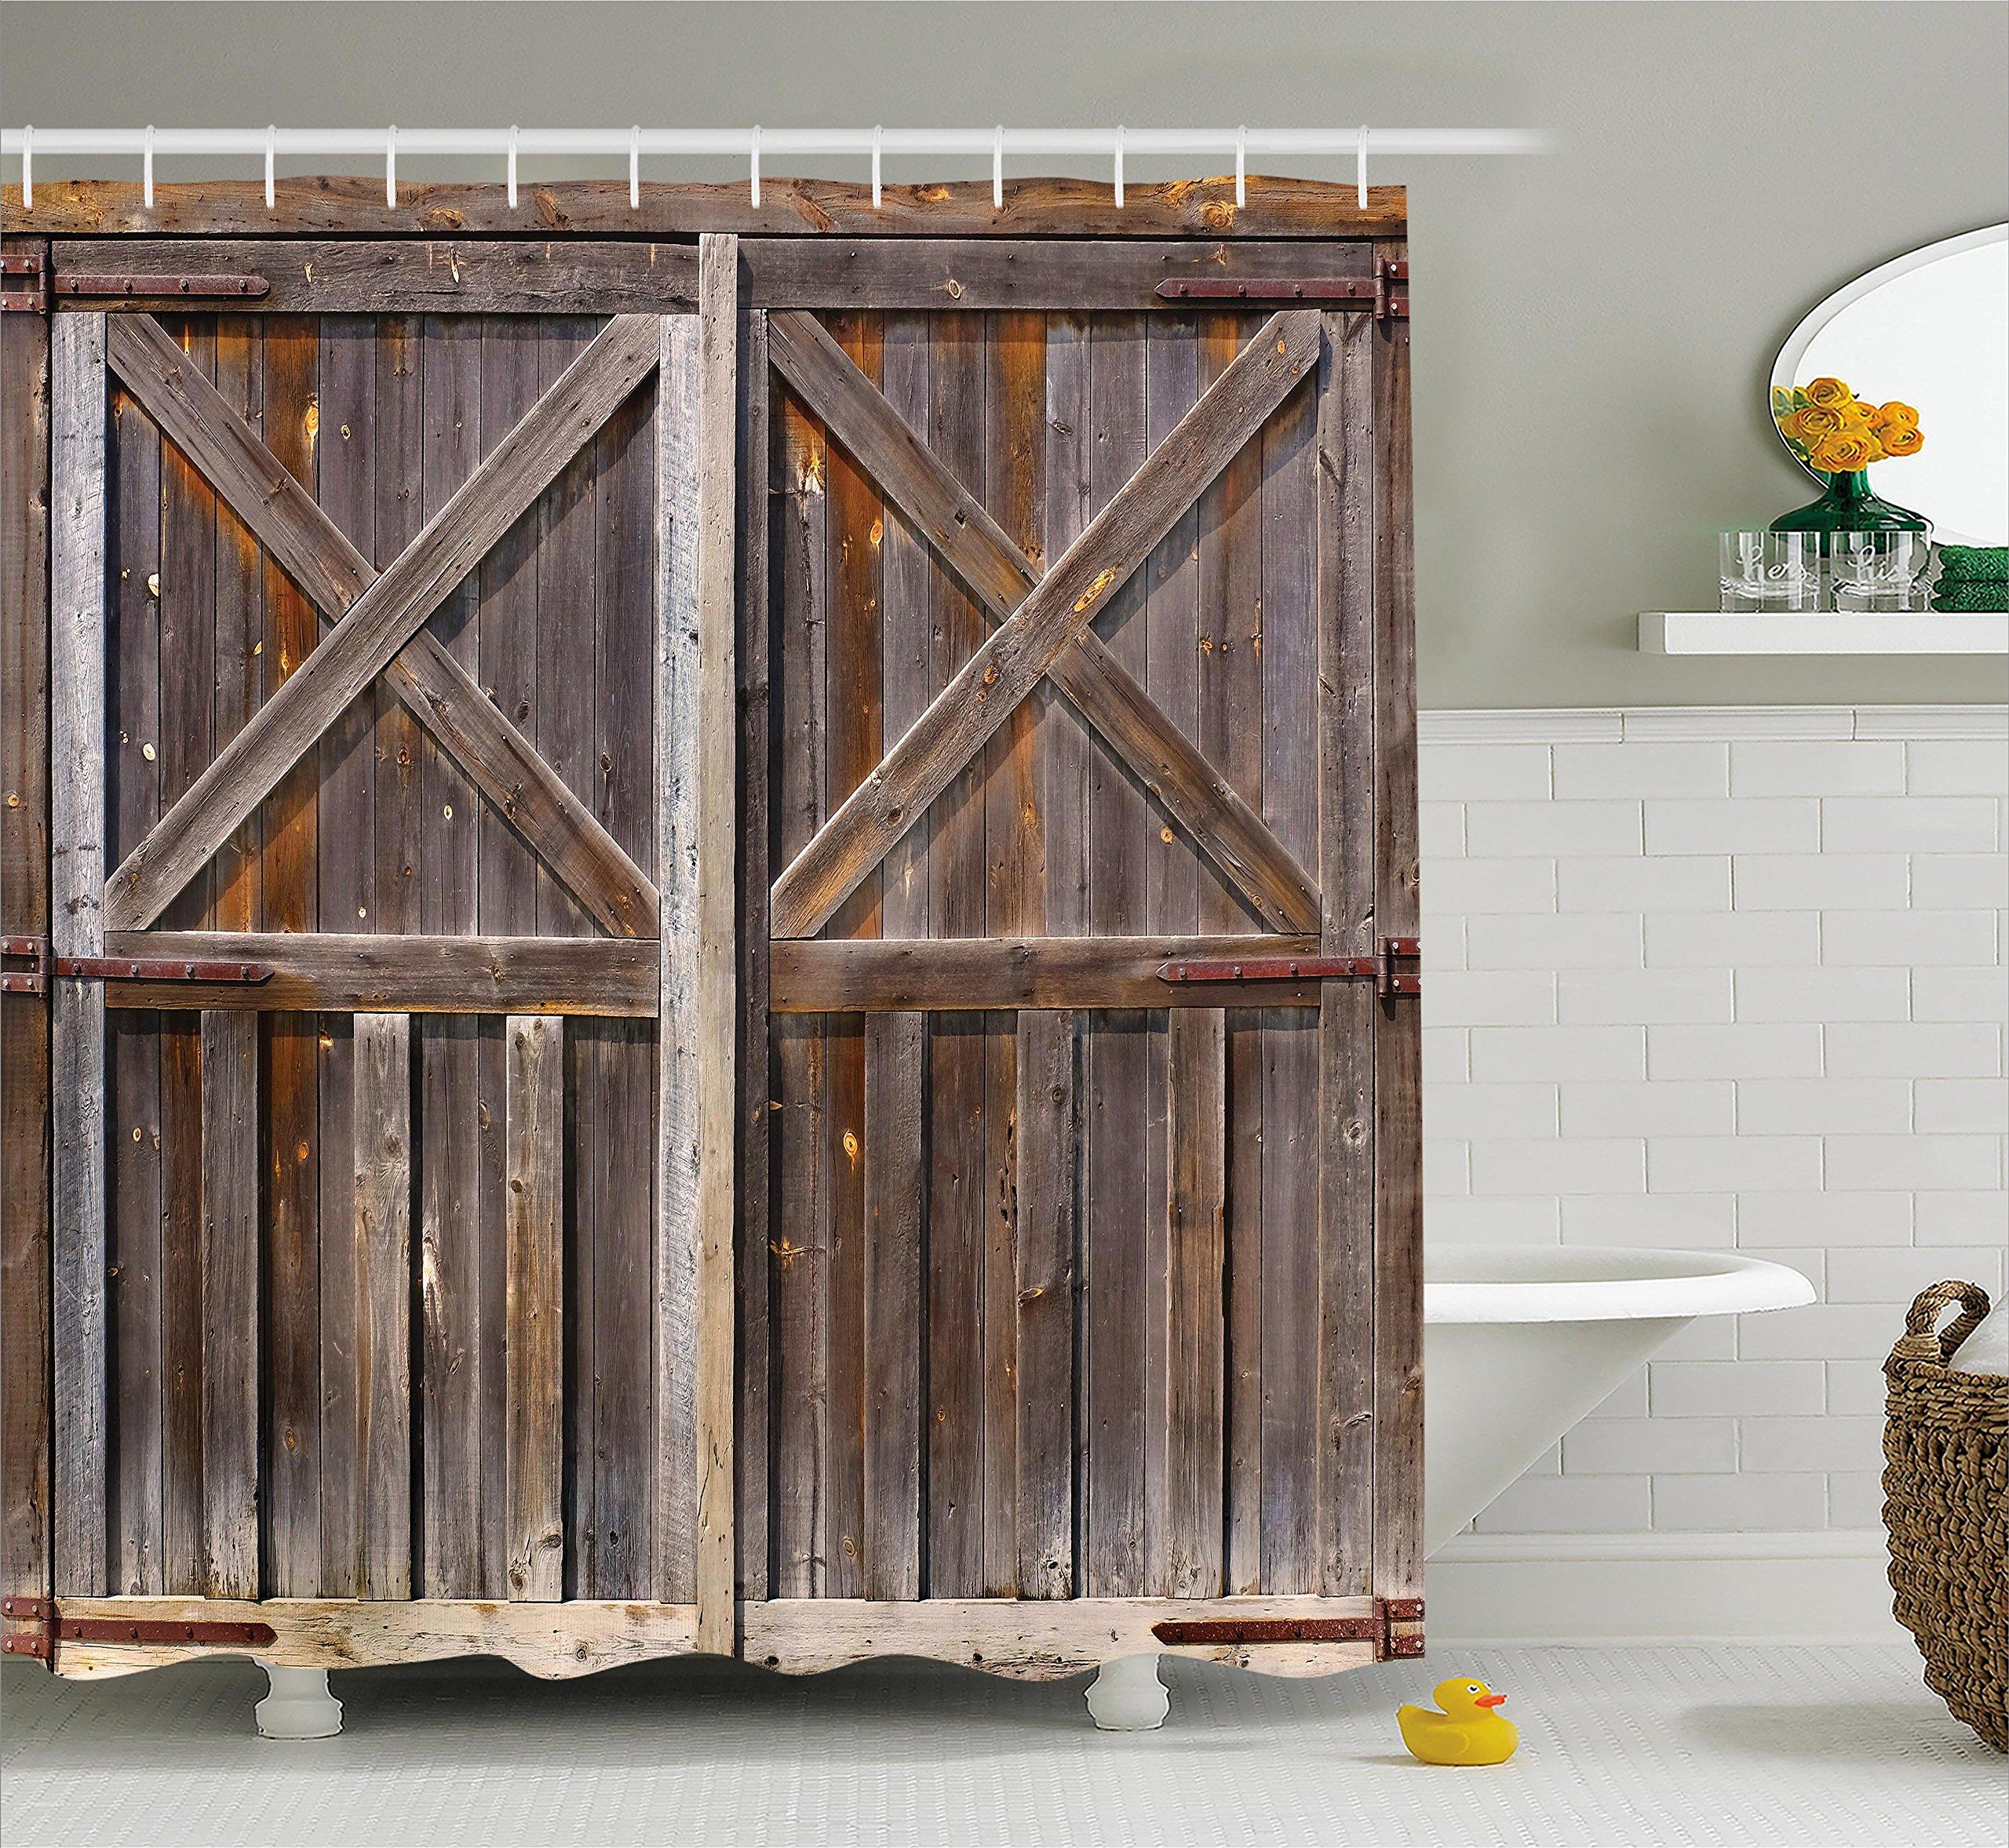 rolling door options doors for budget plus friendly barn diy remodelaholic bathroom pin hardware